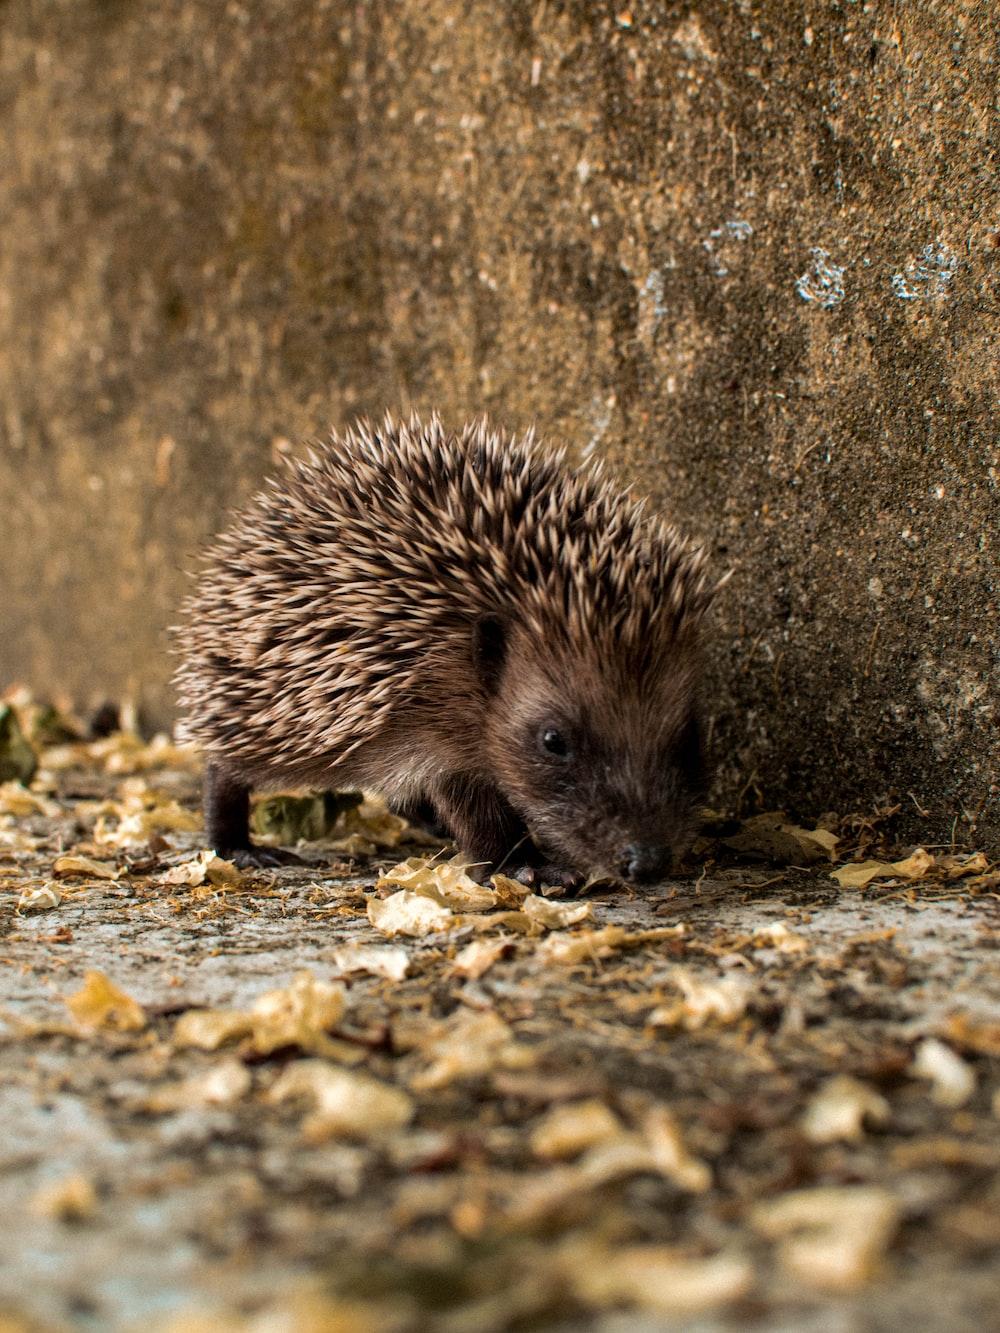 hedgehog on brown rock during daytime